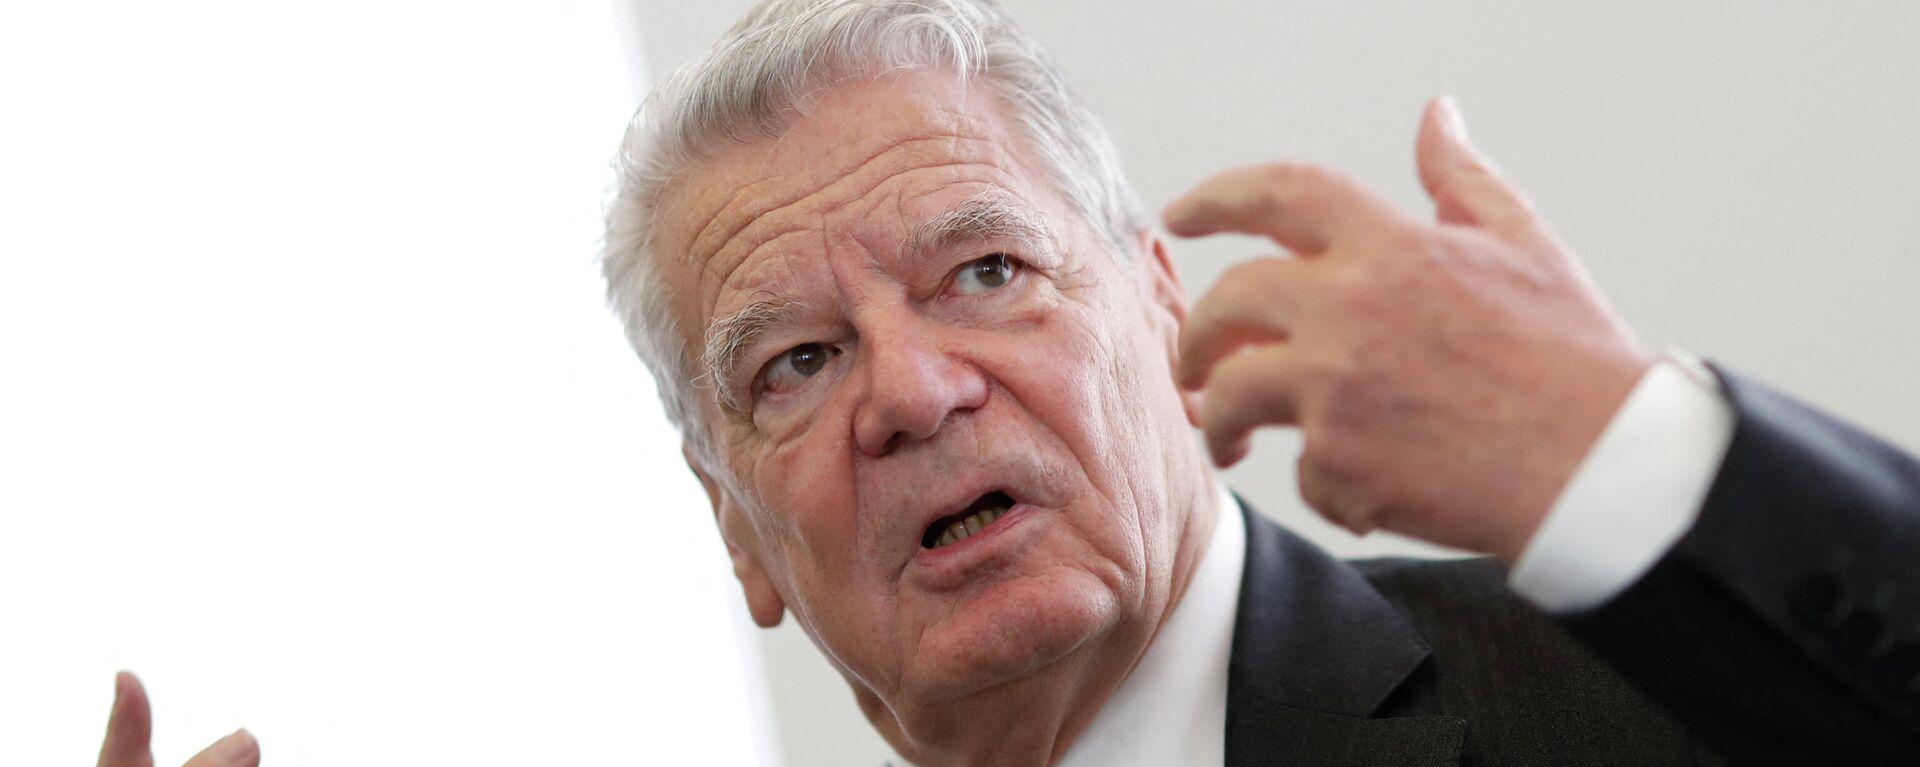 Deutschlands ehemaliger Präsident Joachim Gauck - SNA, 1920, 05.07.2021